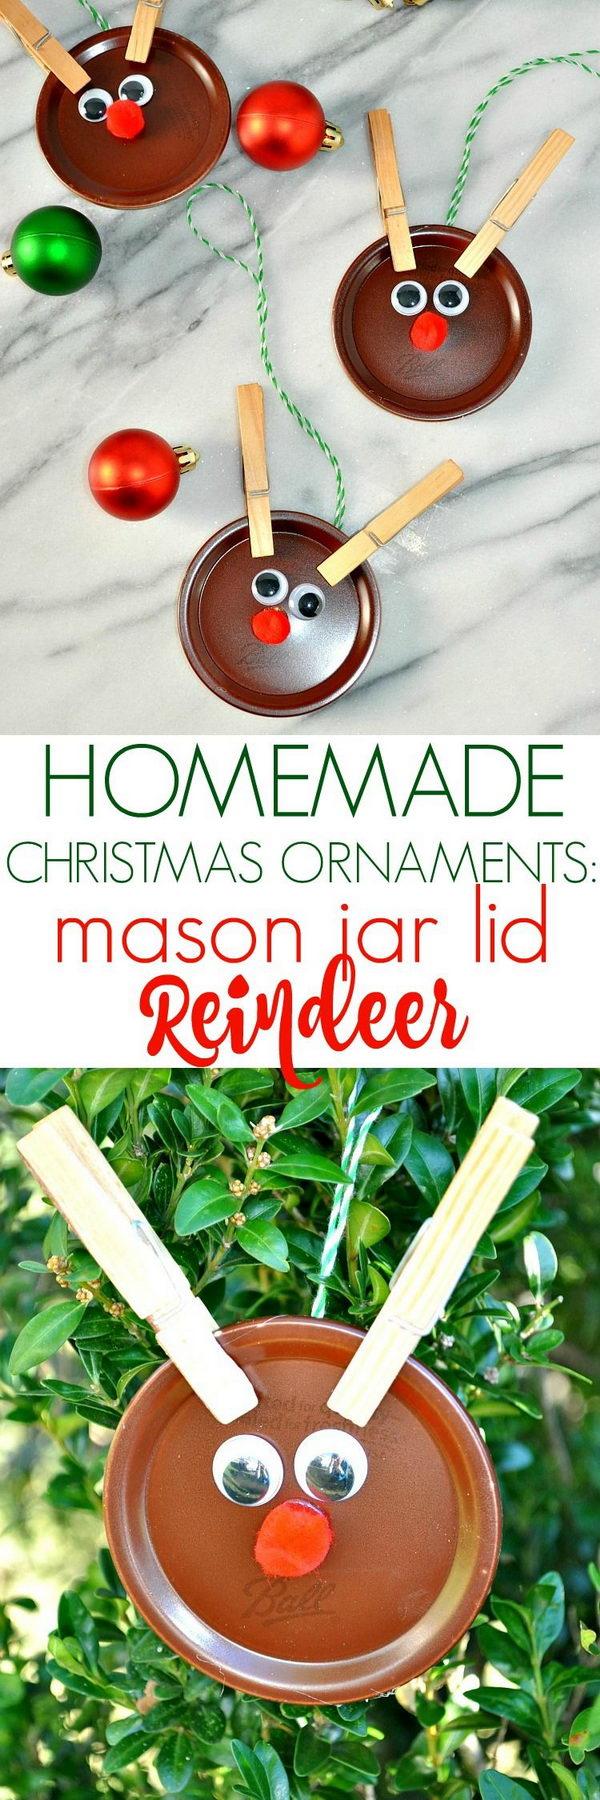 Clothespin Mason Jar Lid Reindeer Ornaments.